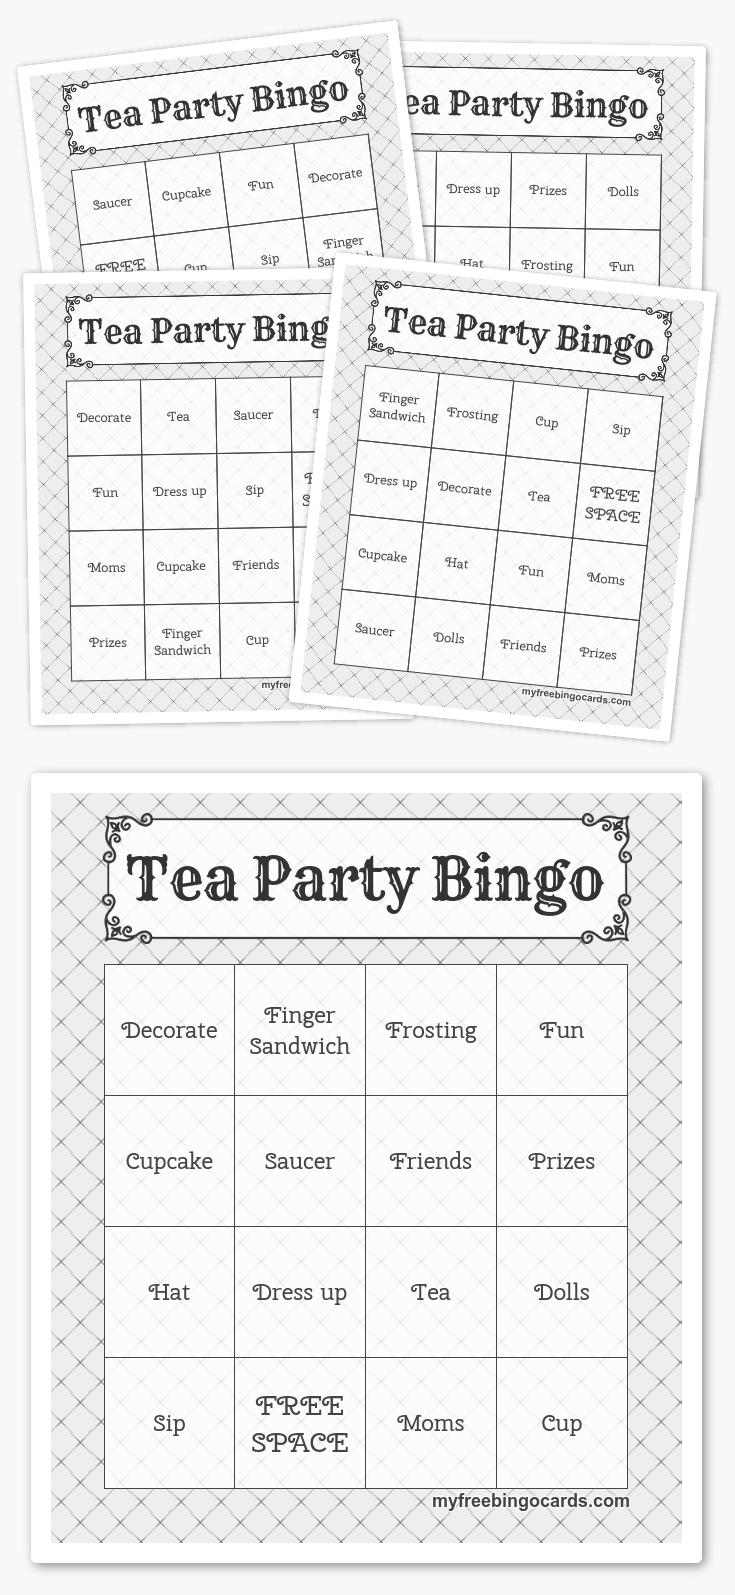 Free Printable Bingo Cards In 2019 | Printables | Pinterest | Harry - Free Printable Bingo Chips